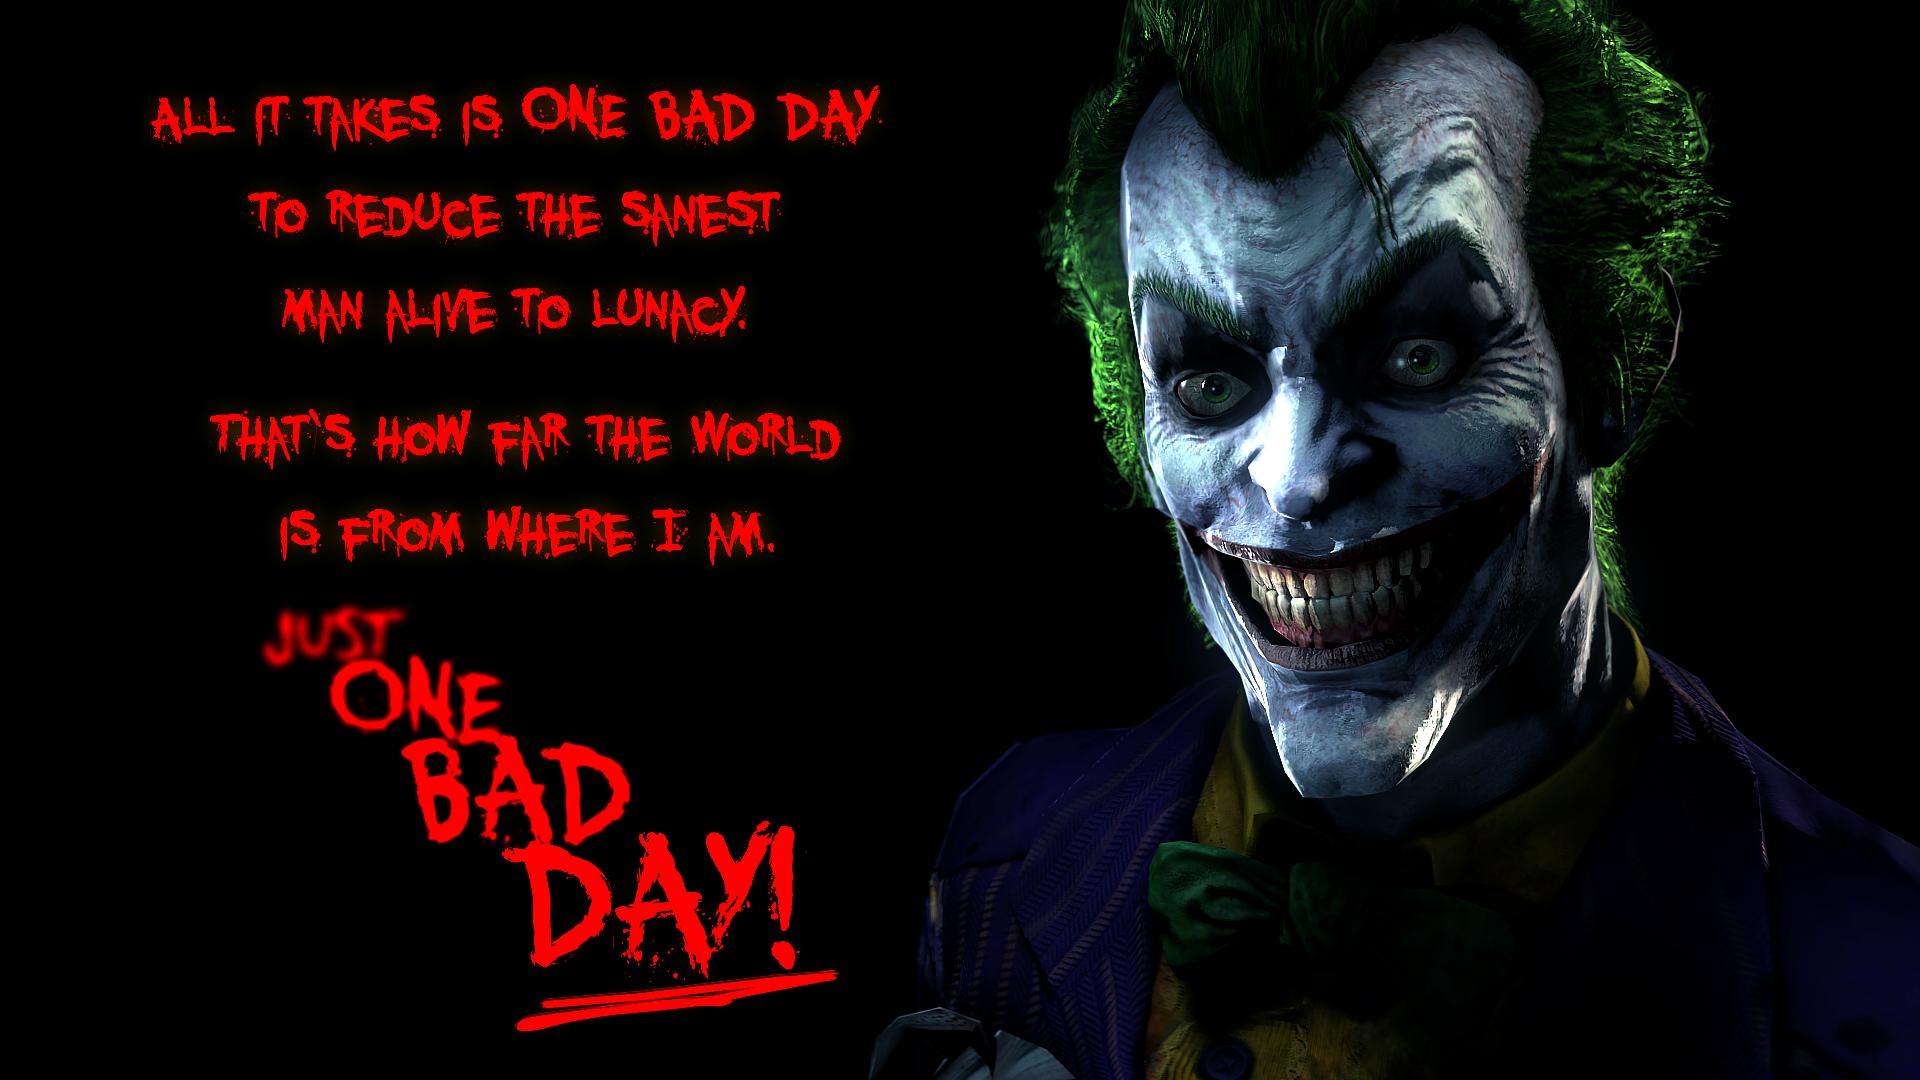 Joker Wallpaper 1080p Joker Wallpapers Joker Joker Pics